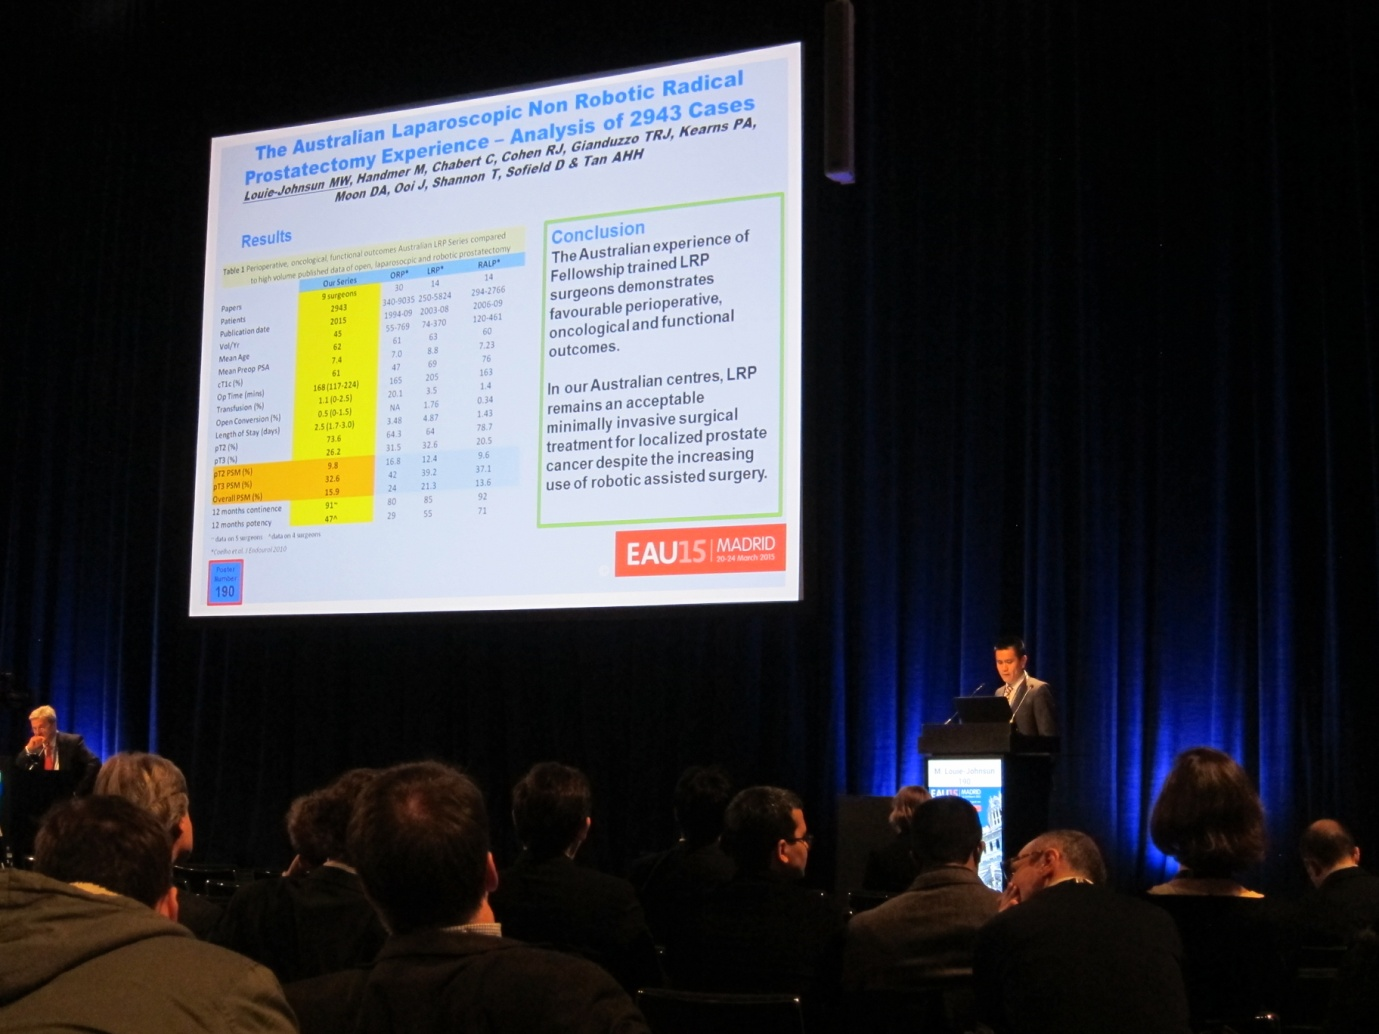 Dr Louie-Johnsun presents at the European Association of Urology (EAU) Meeting, Madrid 2015